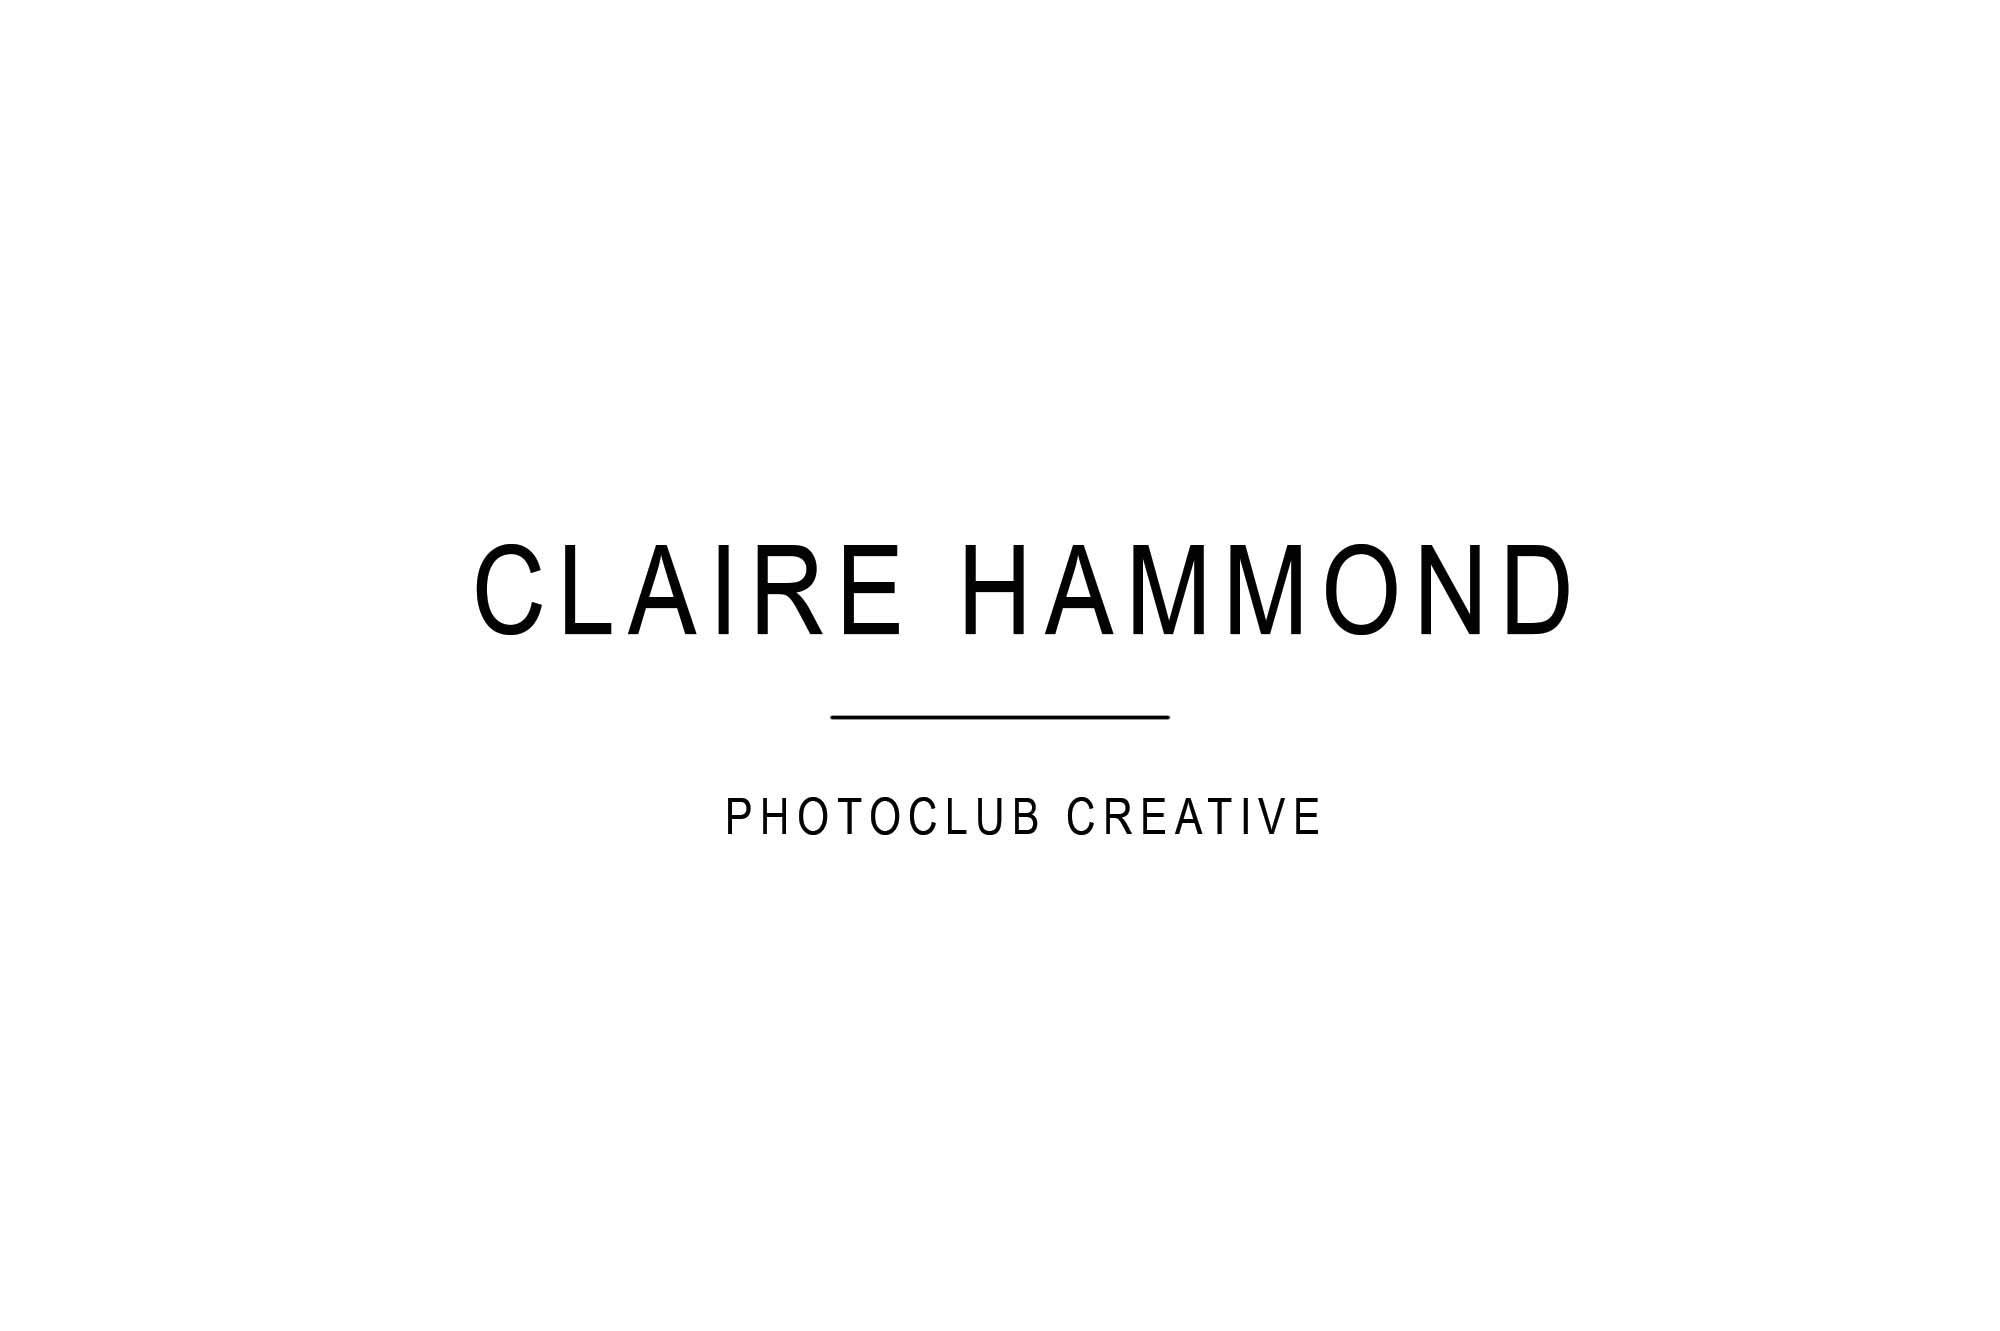 ClaireHammond_00_Title_WhtBg.jpg